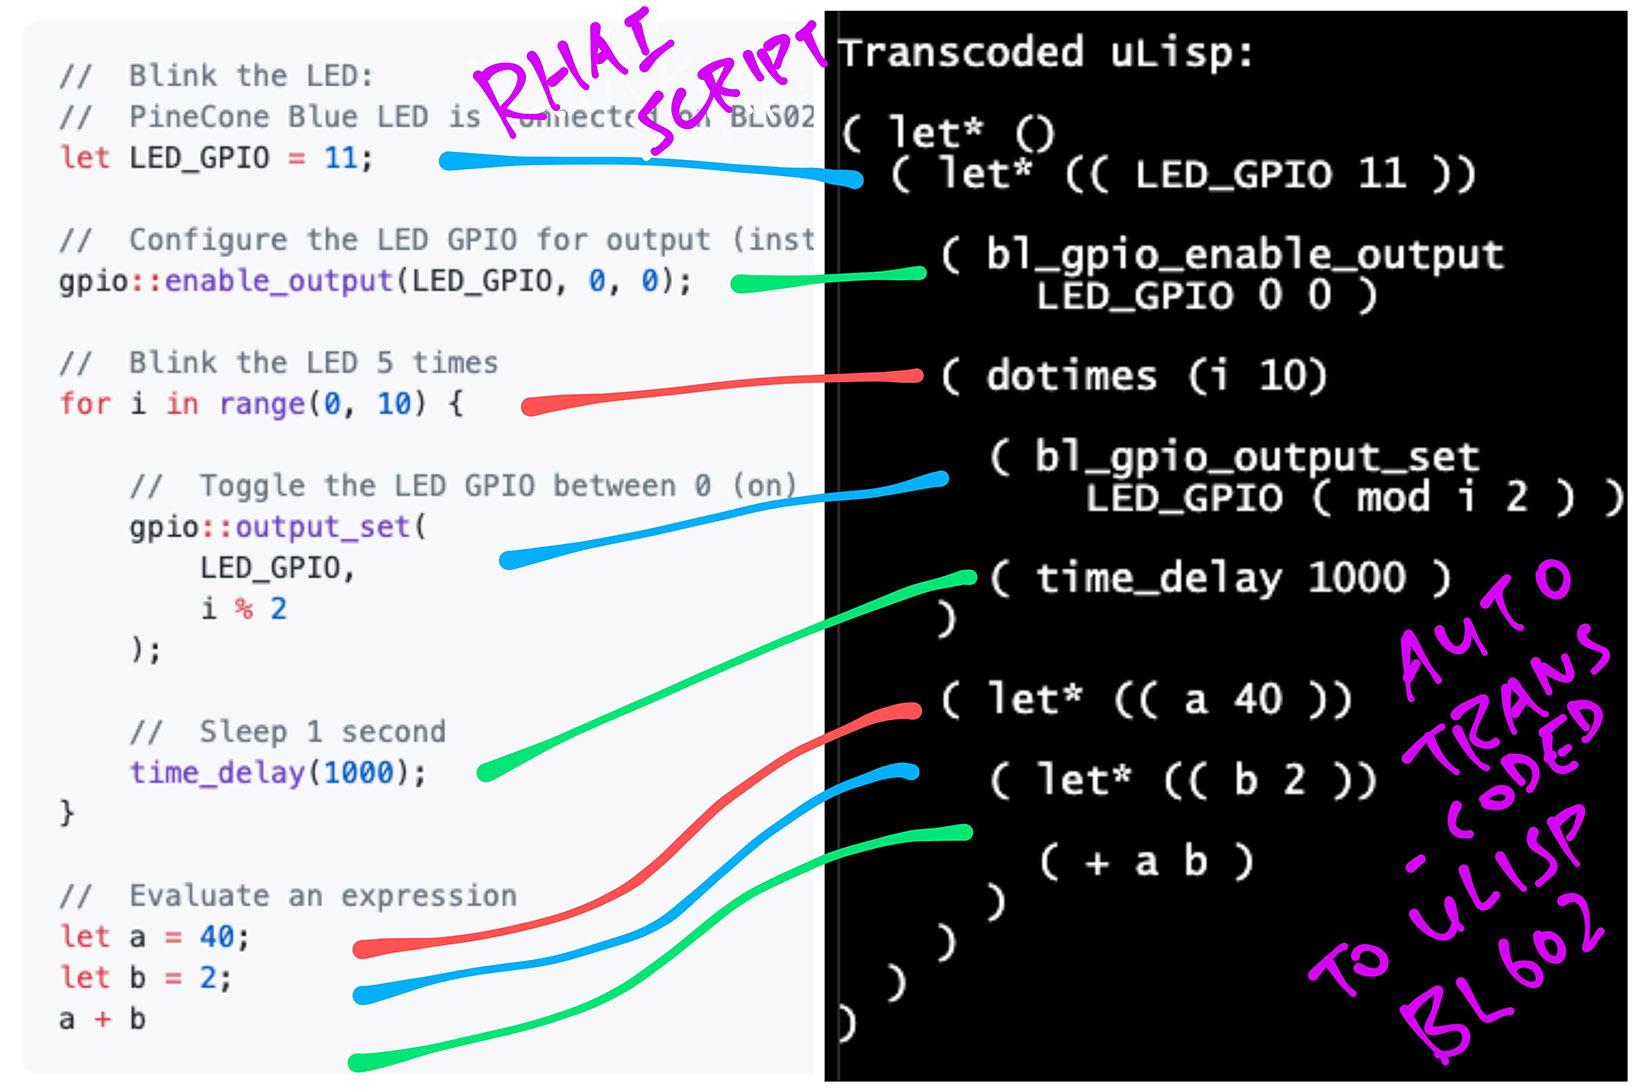 Rhai Script transcoded to uLisp